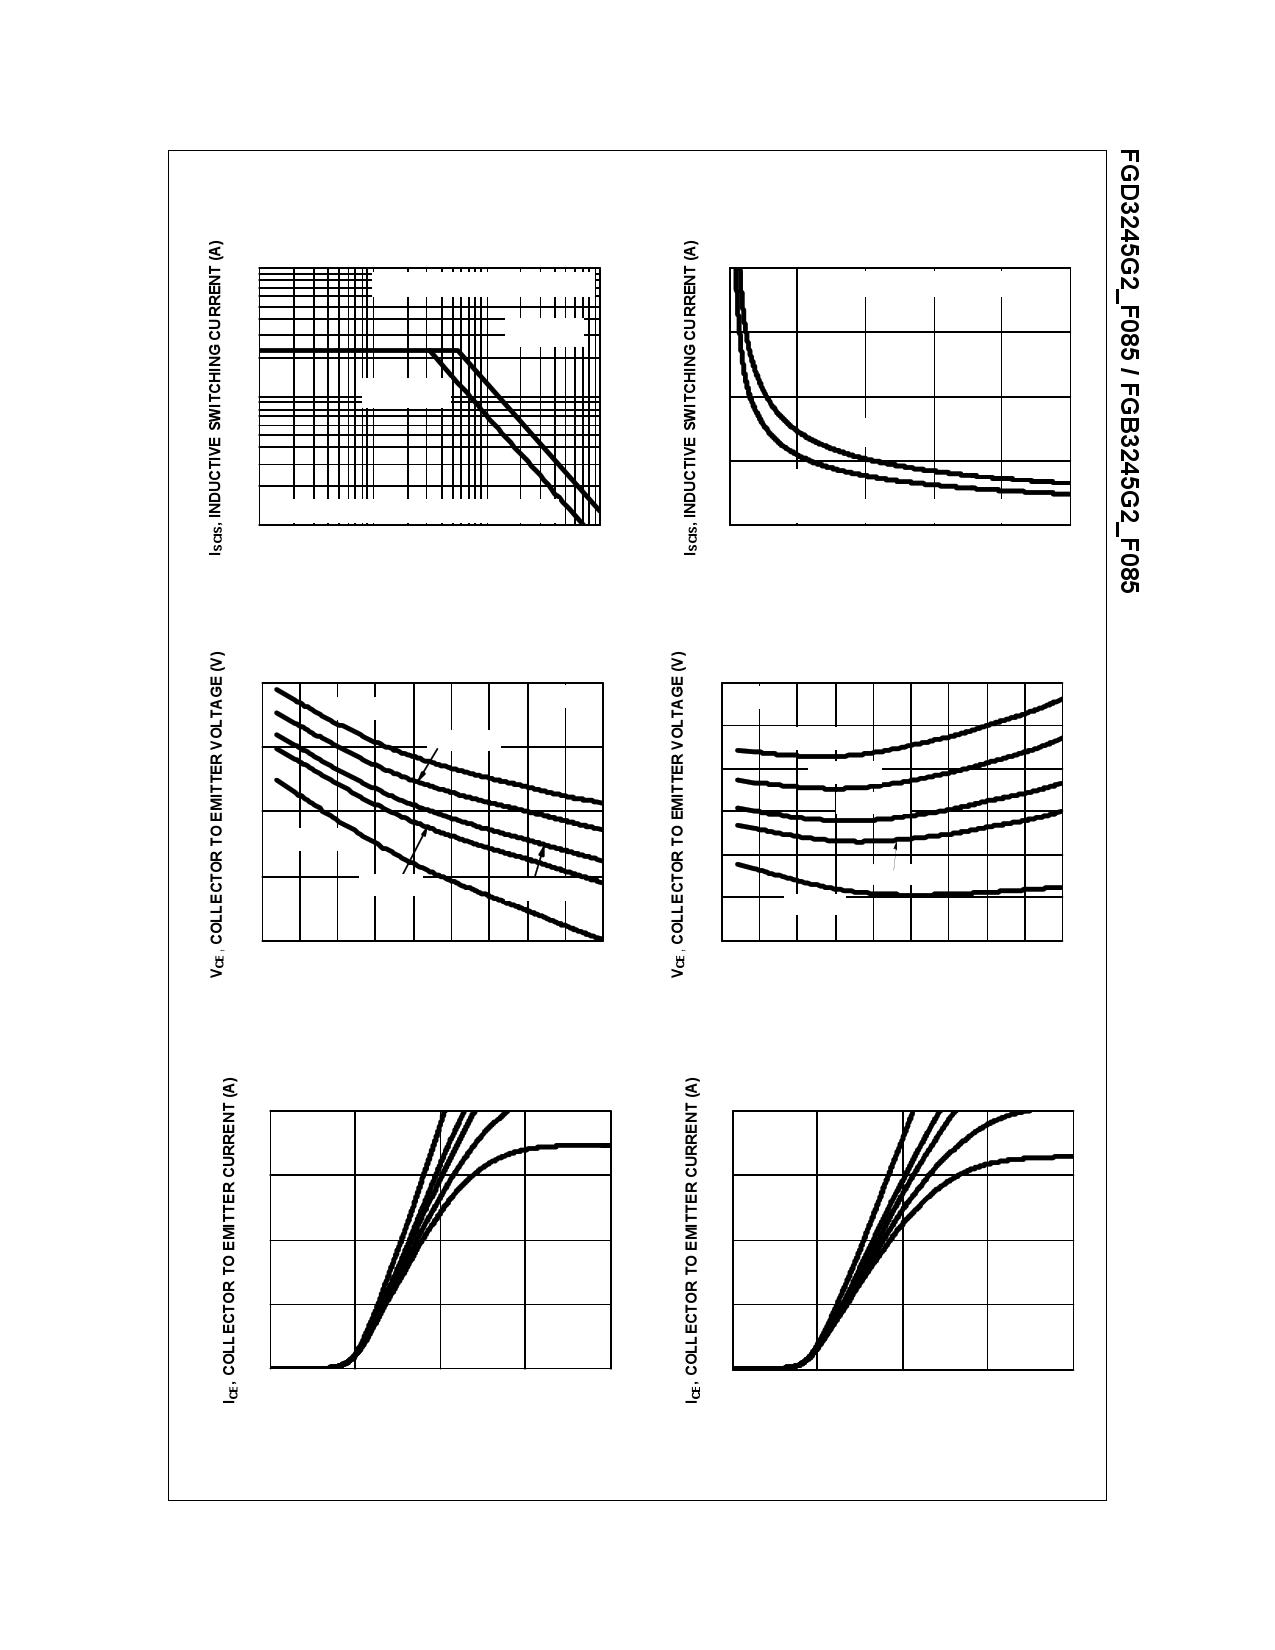 FGB3245G2_F085 pdf, 반도체, 판매, 대치품